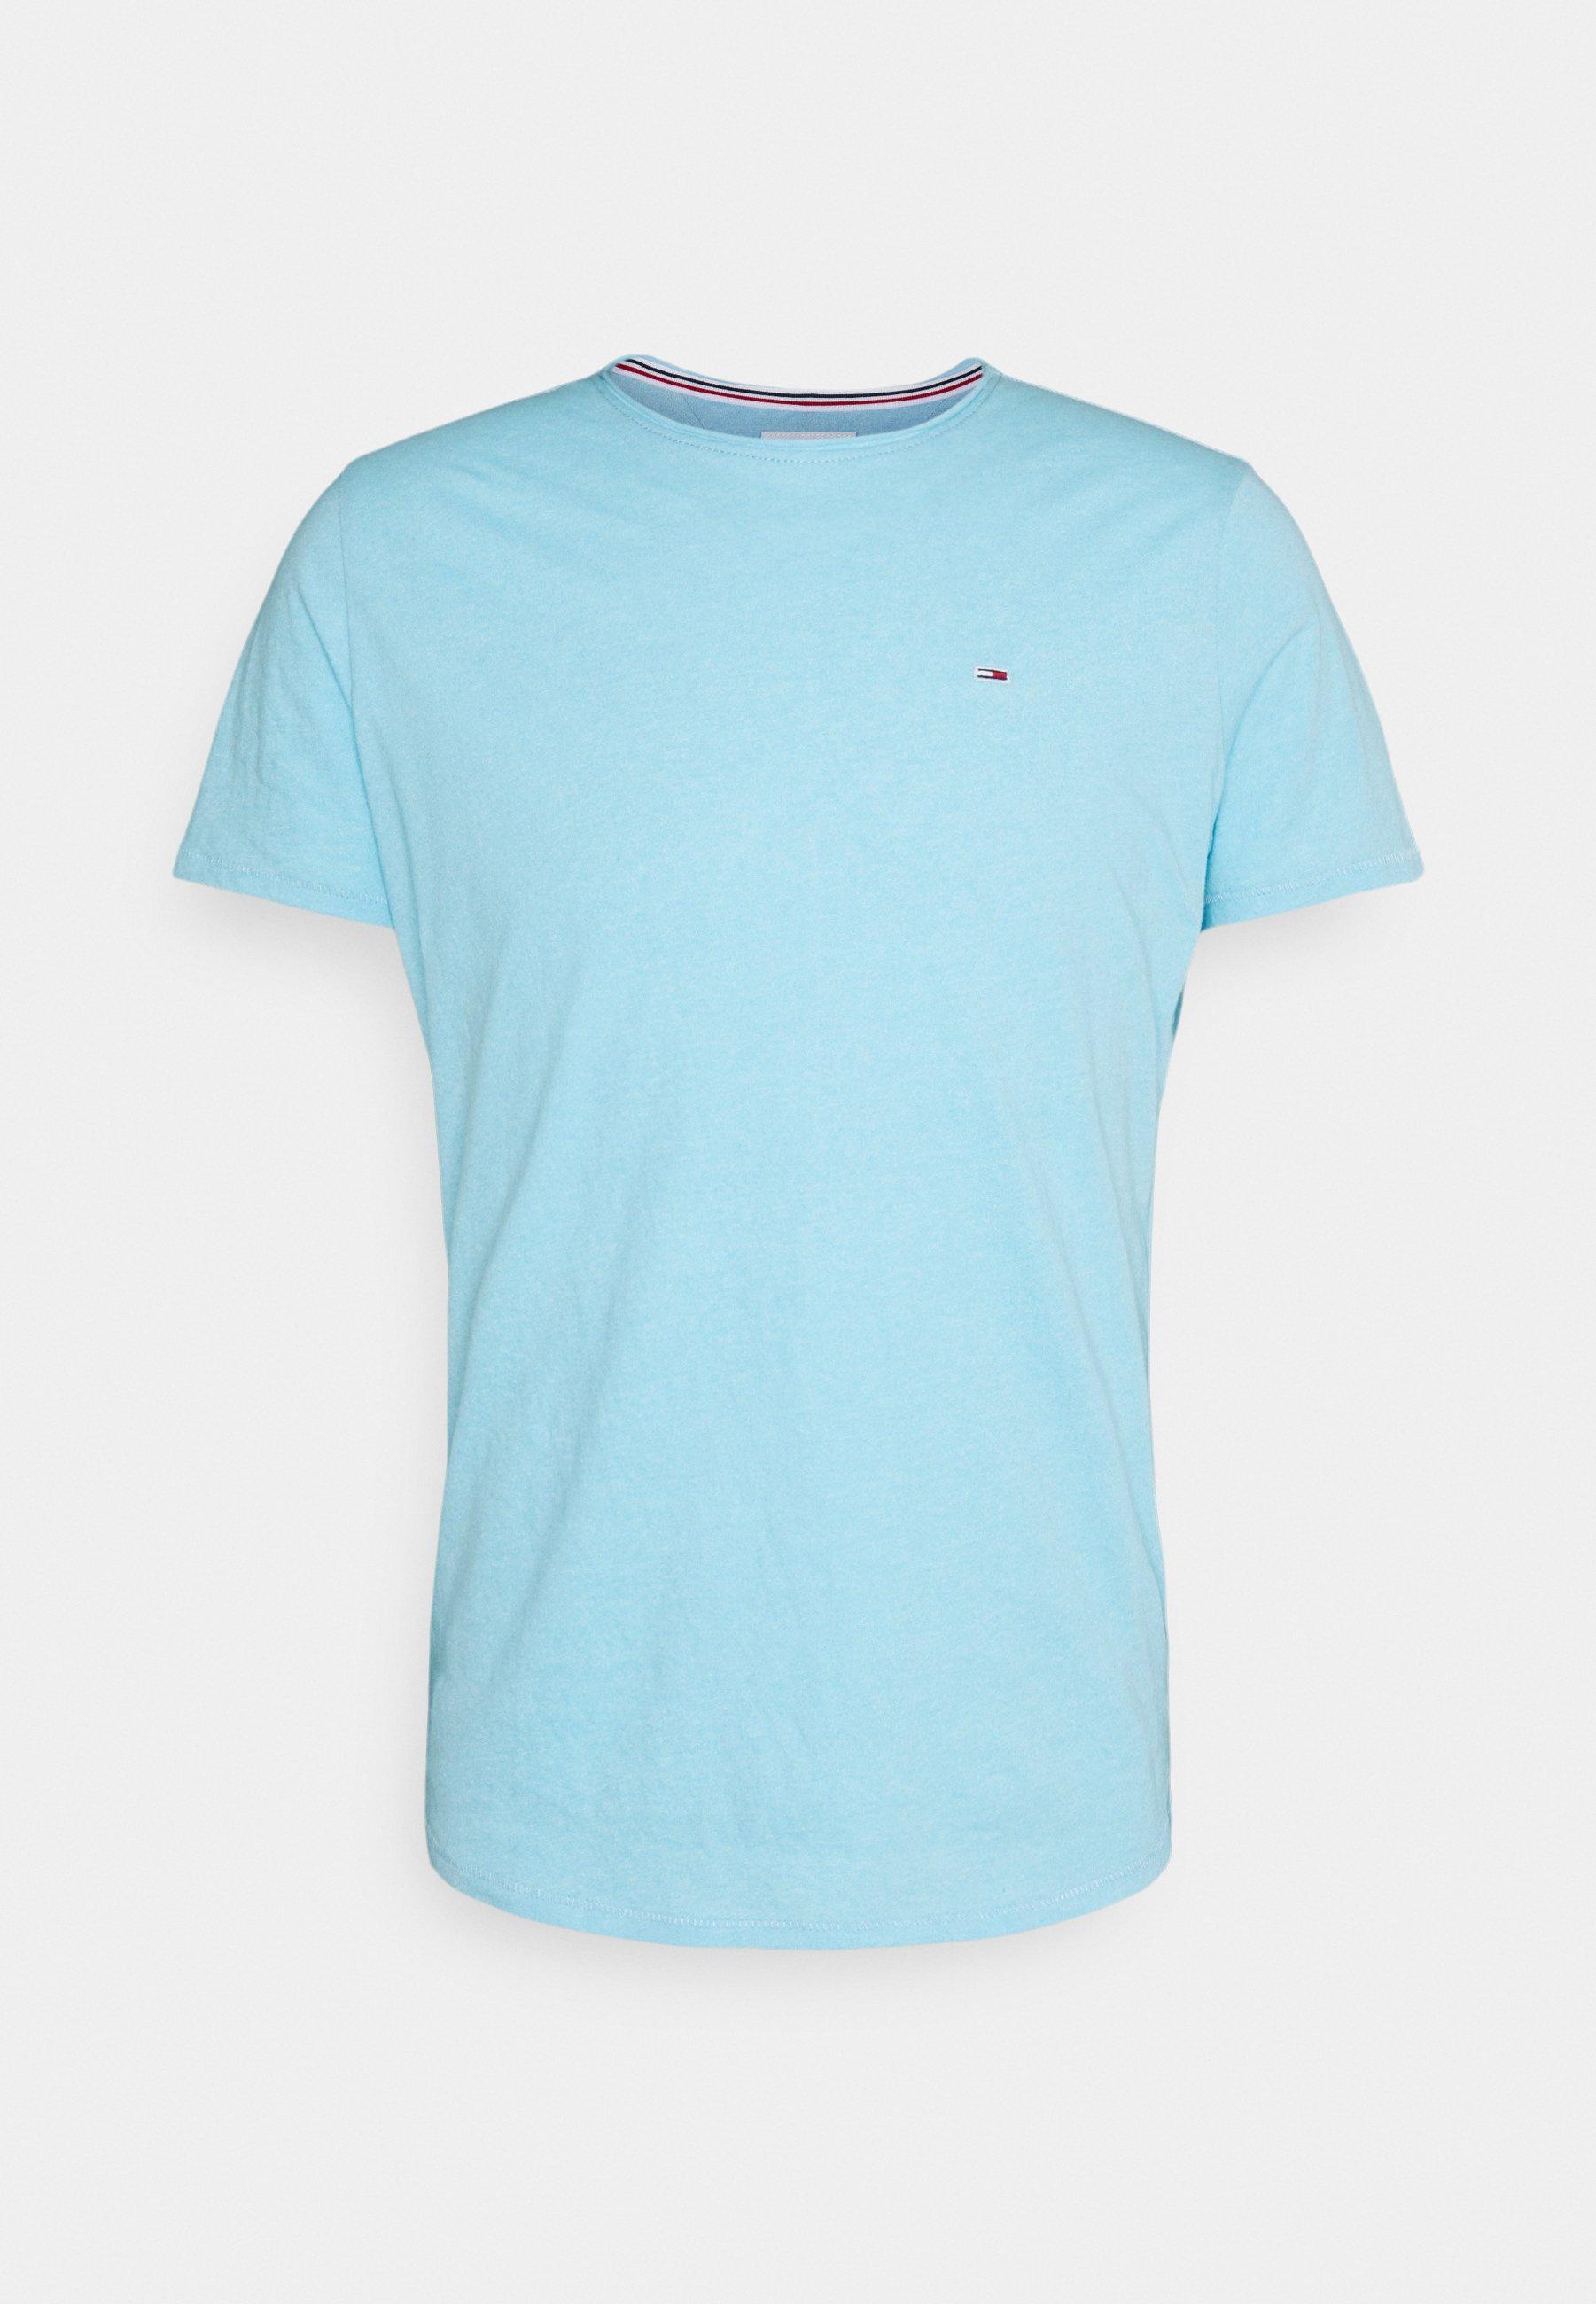 Uomo SLIM JASPE C NECK - T-shirt basic